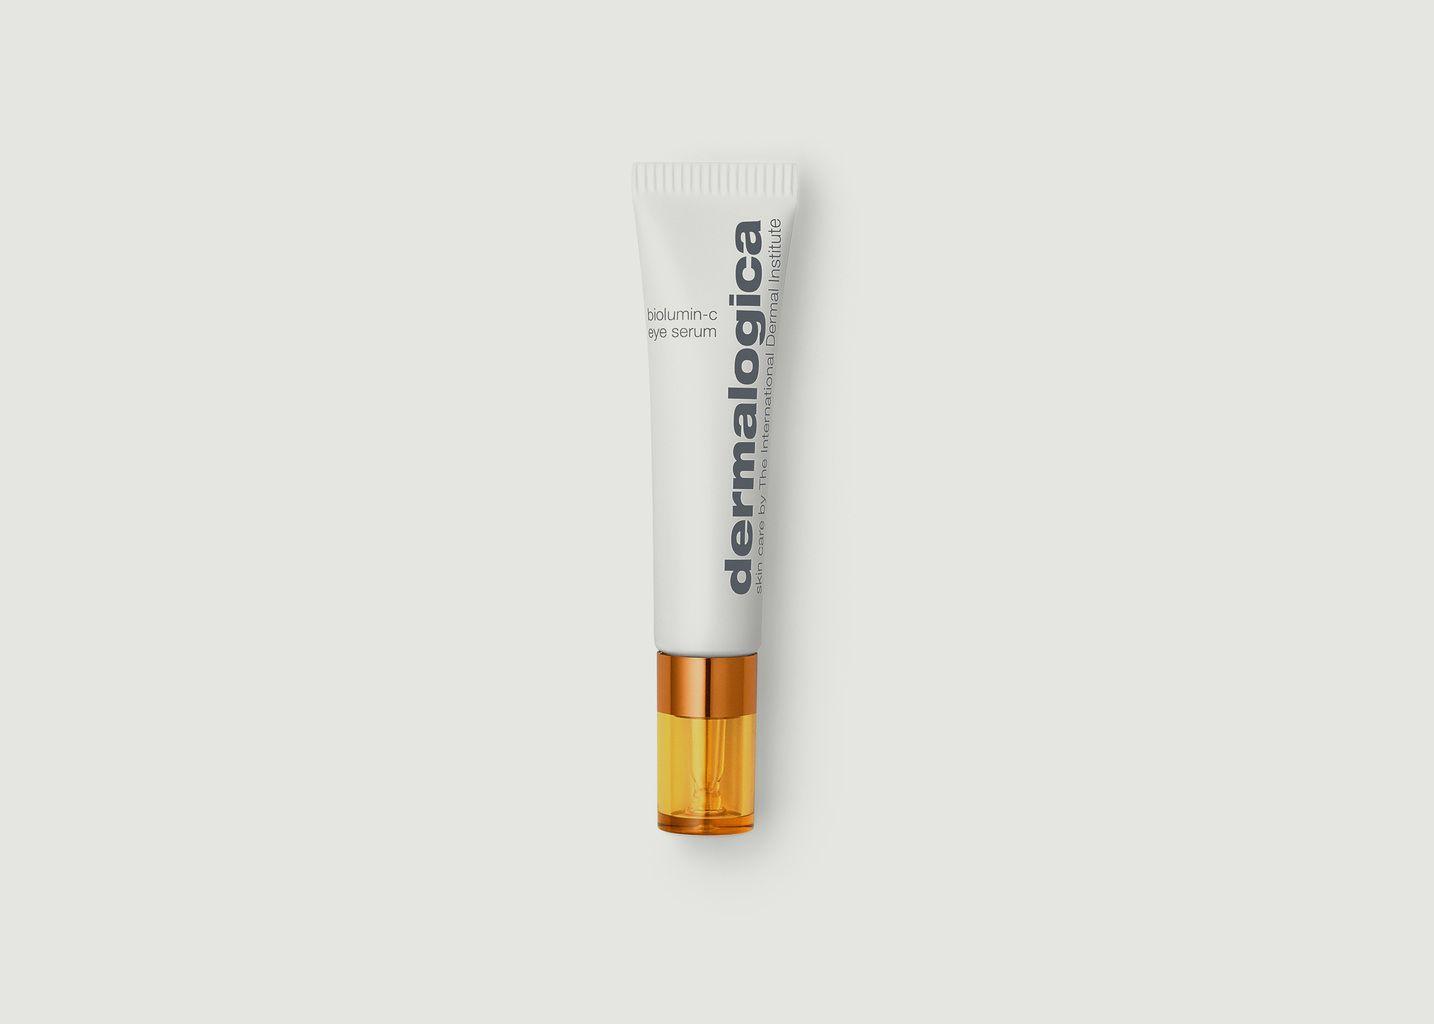 BioluminC eye serum - Dermalogica